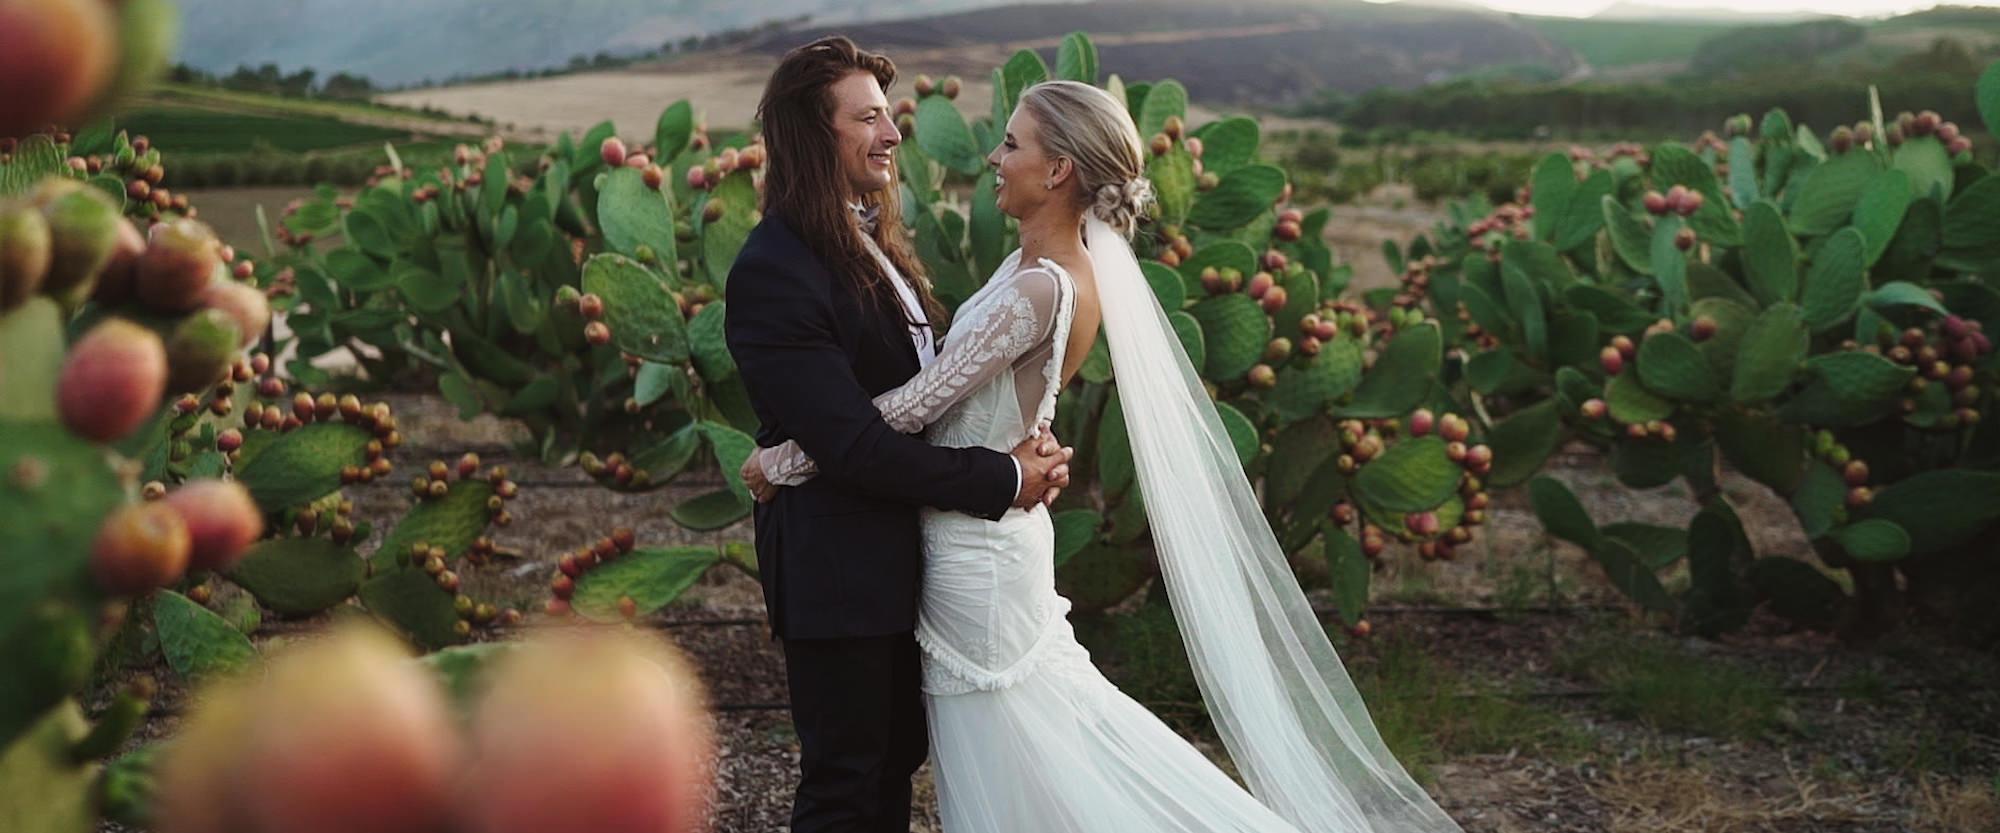 HeathEmelieWeddingFilm_Babylonstoren_Wedding_12.jpg